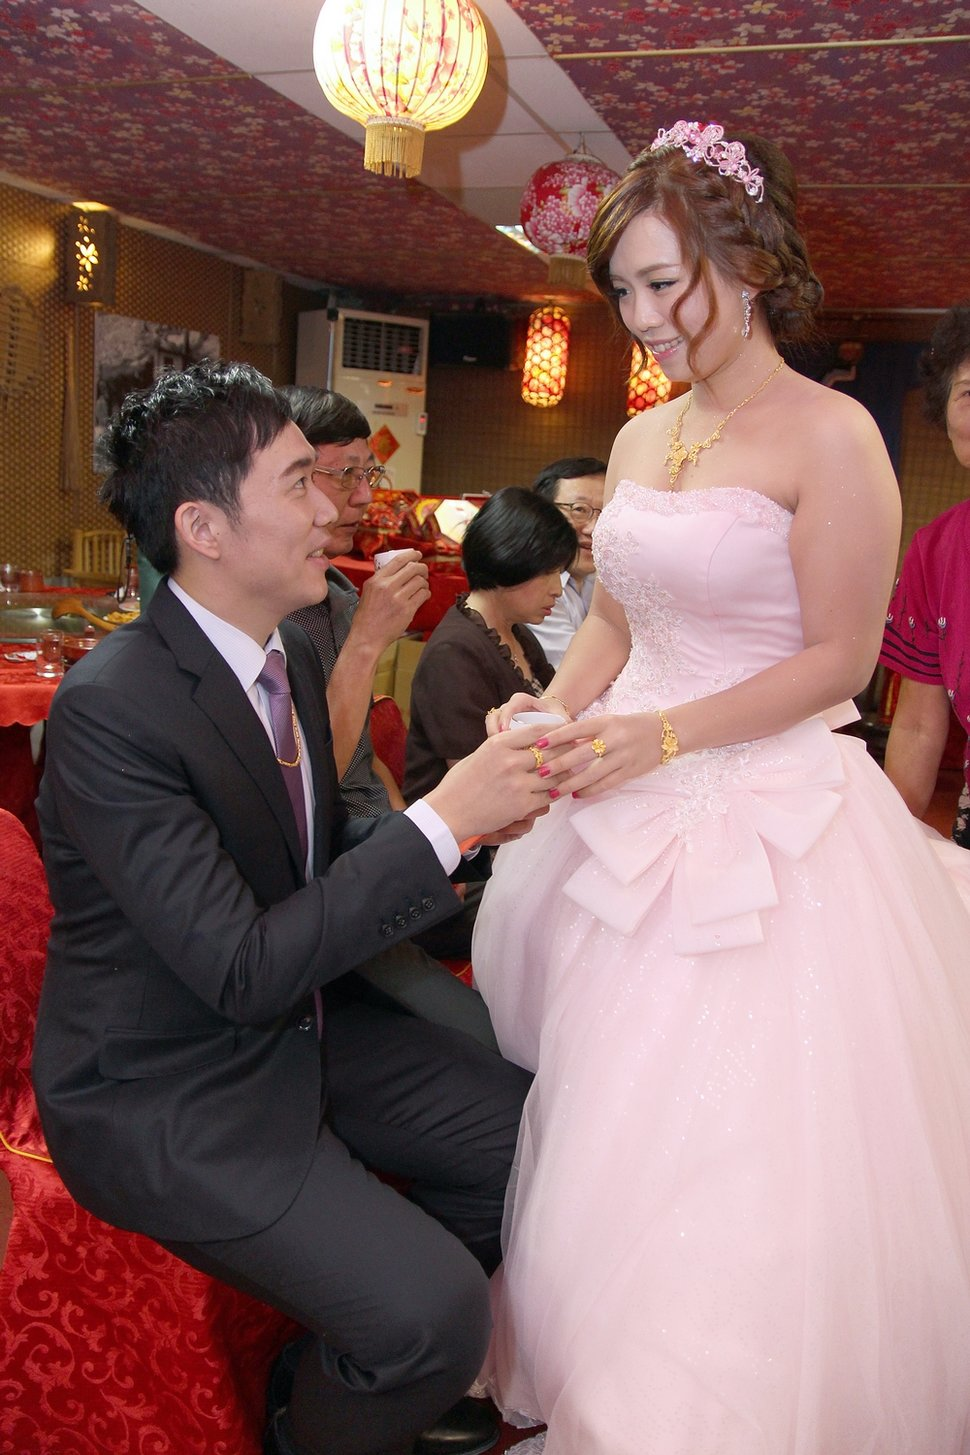 IMG_0167 - 瑞比特婚禮紀錄攝影 - 結婚吧